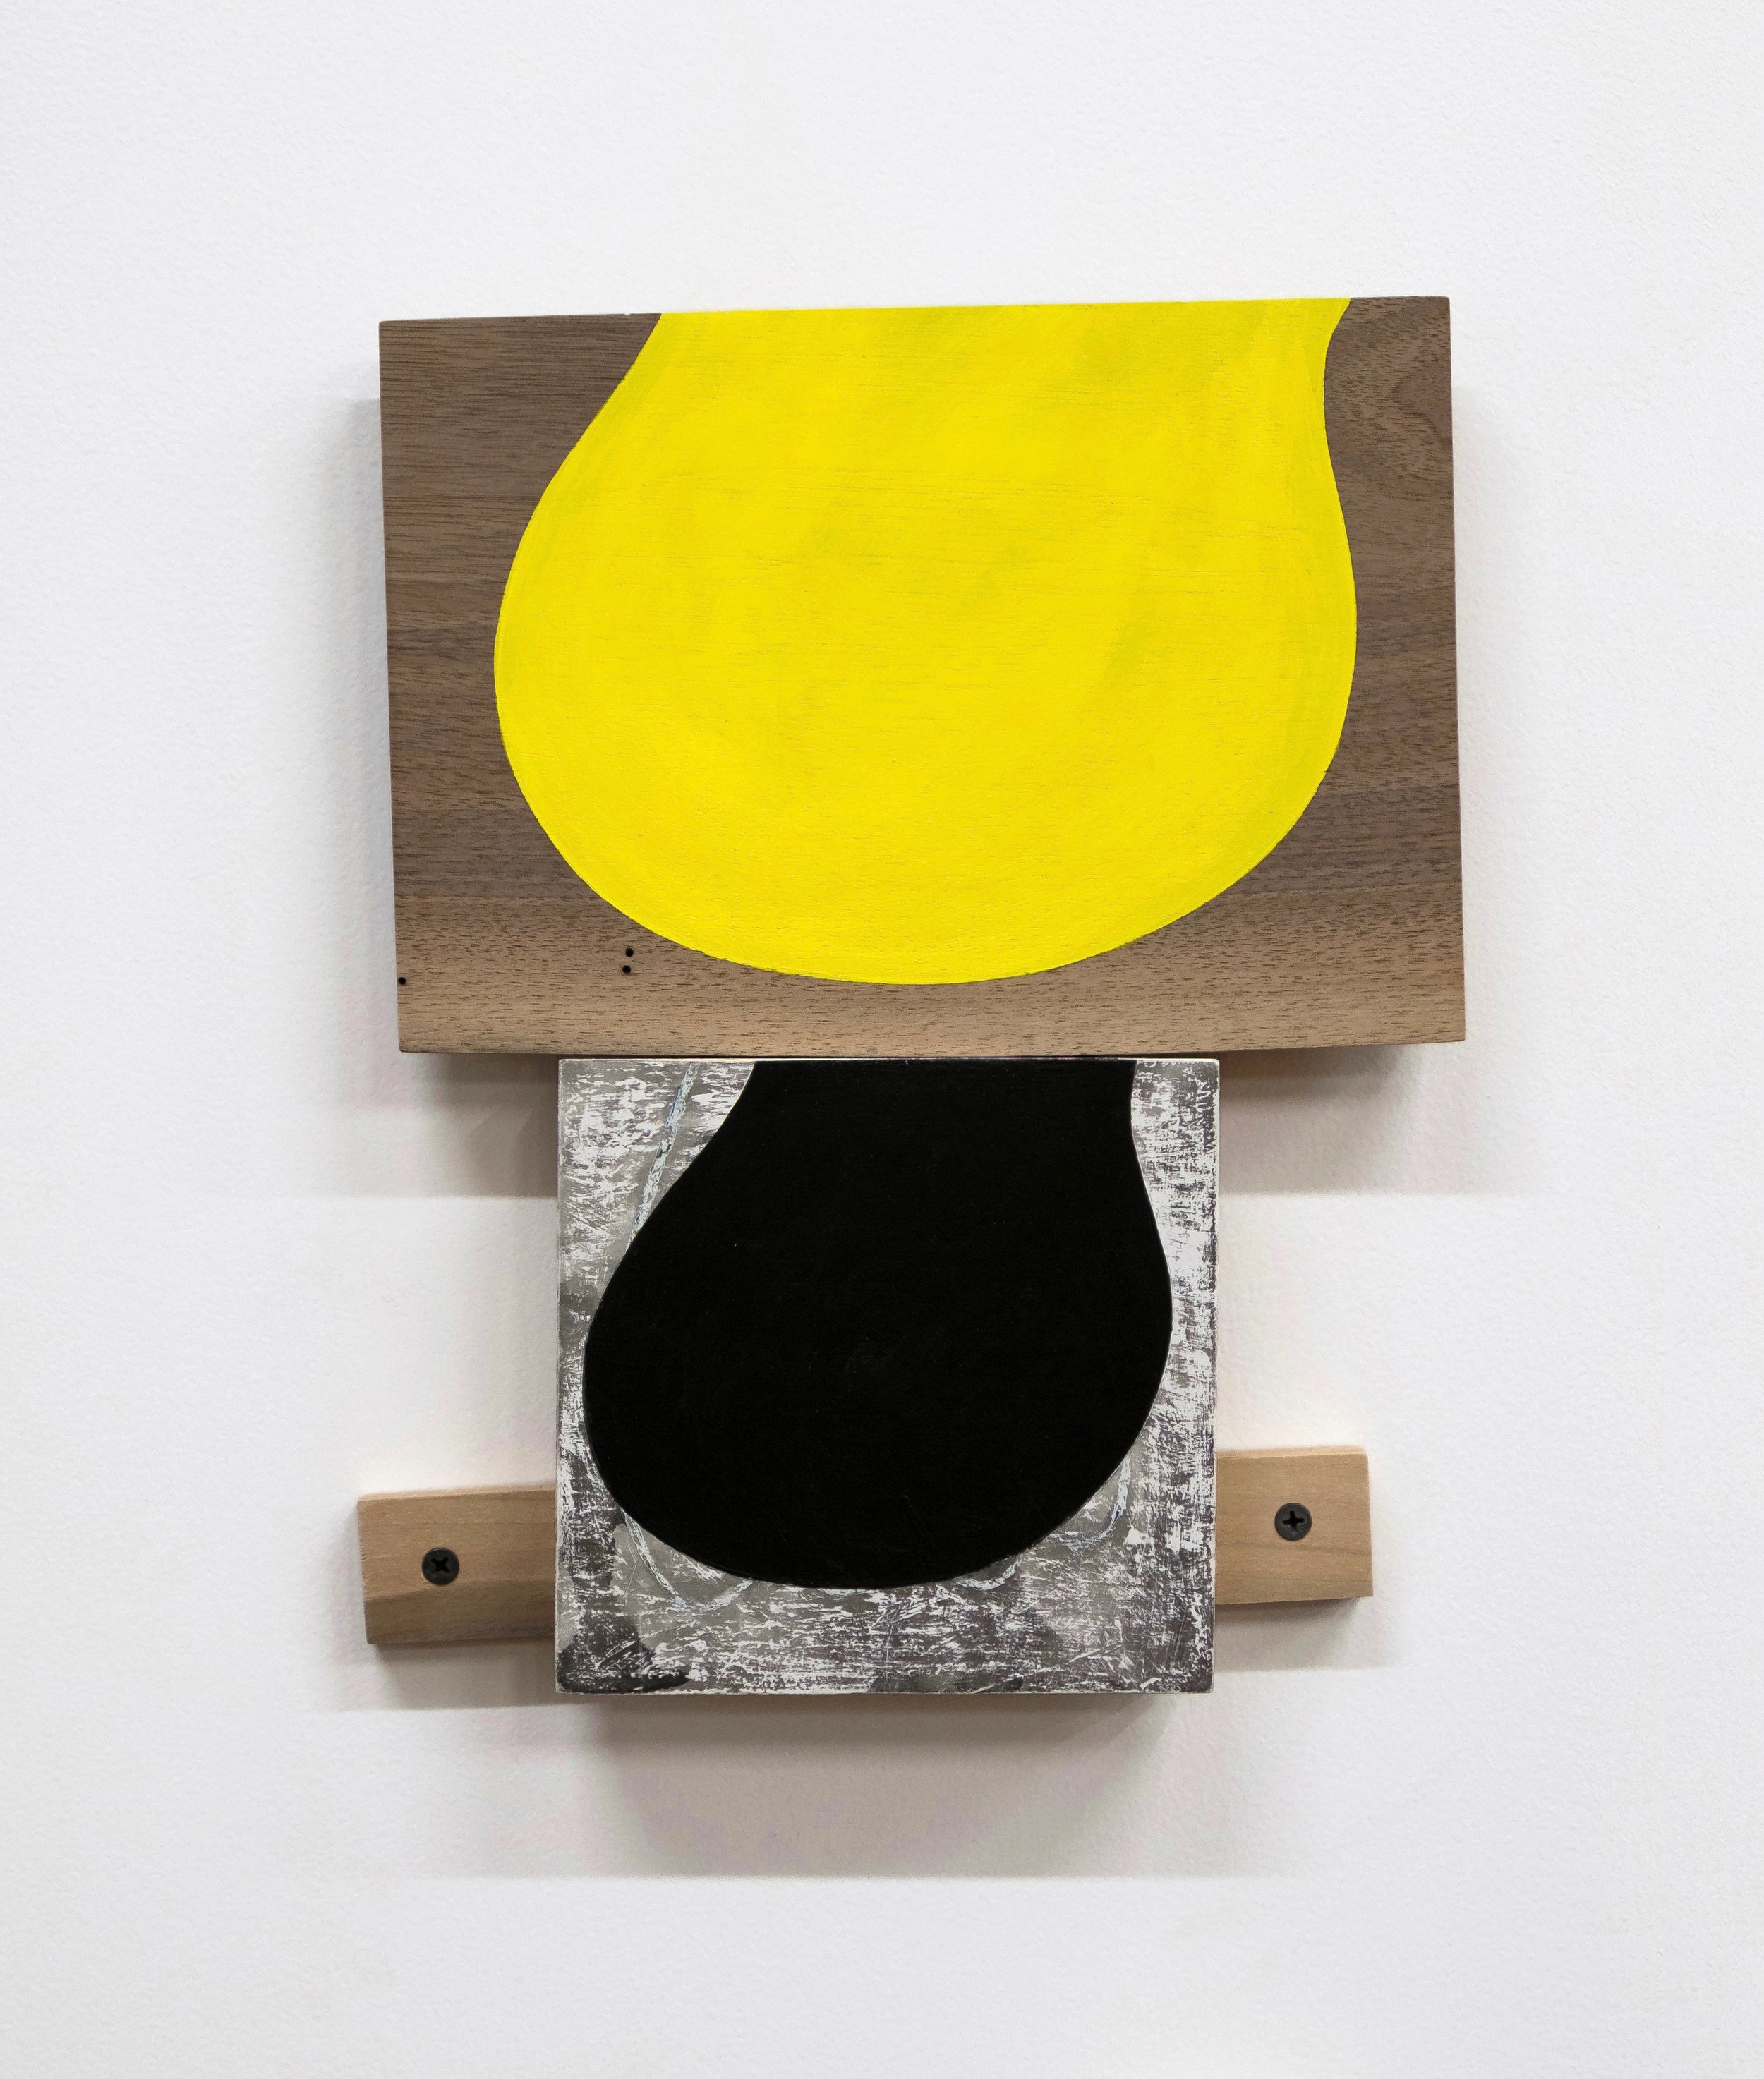 "Untitled, 2019, ink, paint, wood, screws,11-3/4 x 10 x 1-1/4"""